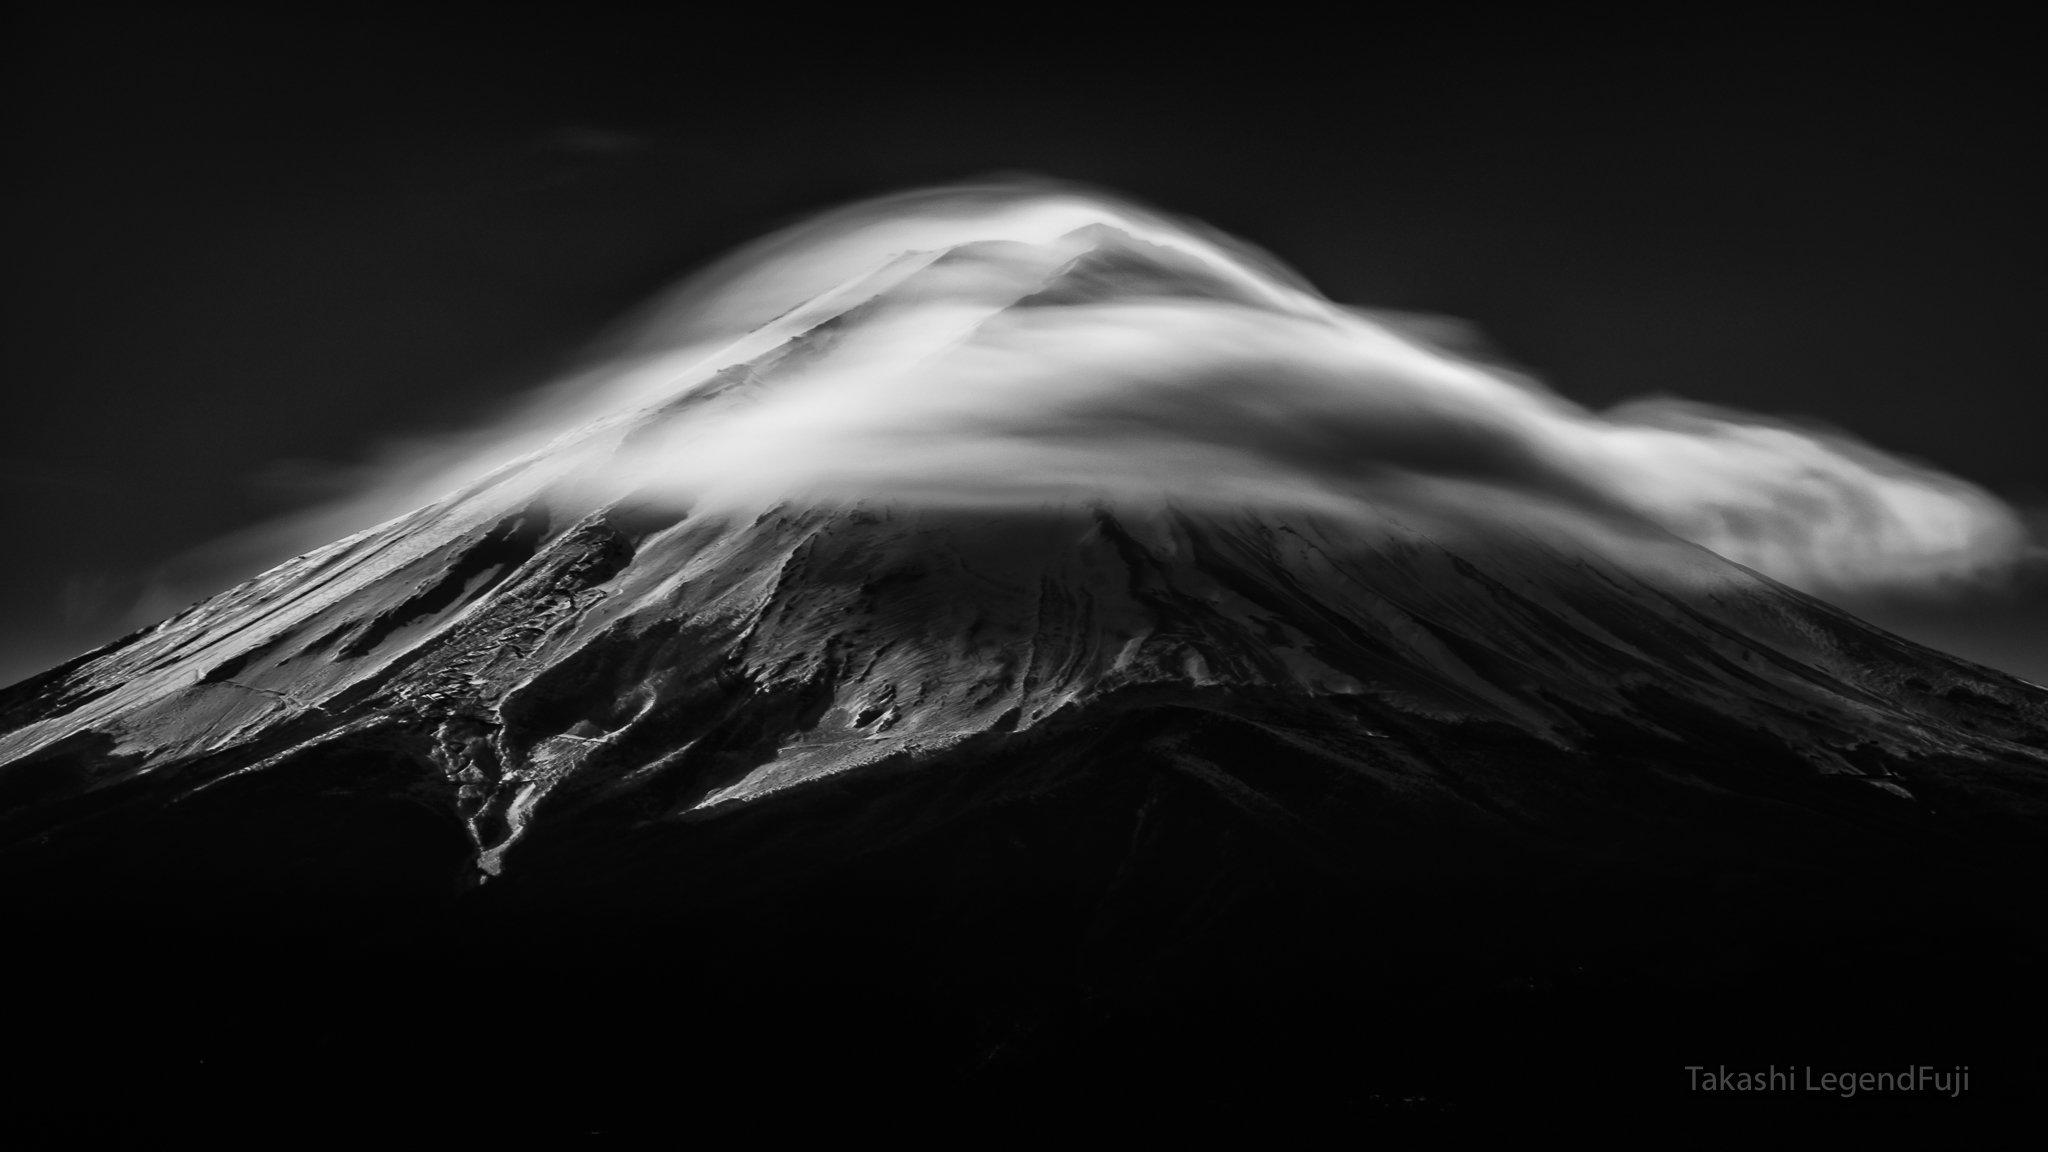 fuji,mountain,japan,cloud,lenticular,snow,black & white,monochrome,simple,amazing,fantastic,wonderful,landscape,, Takashi